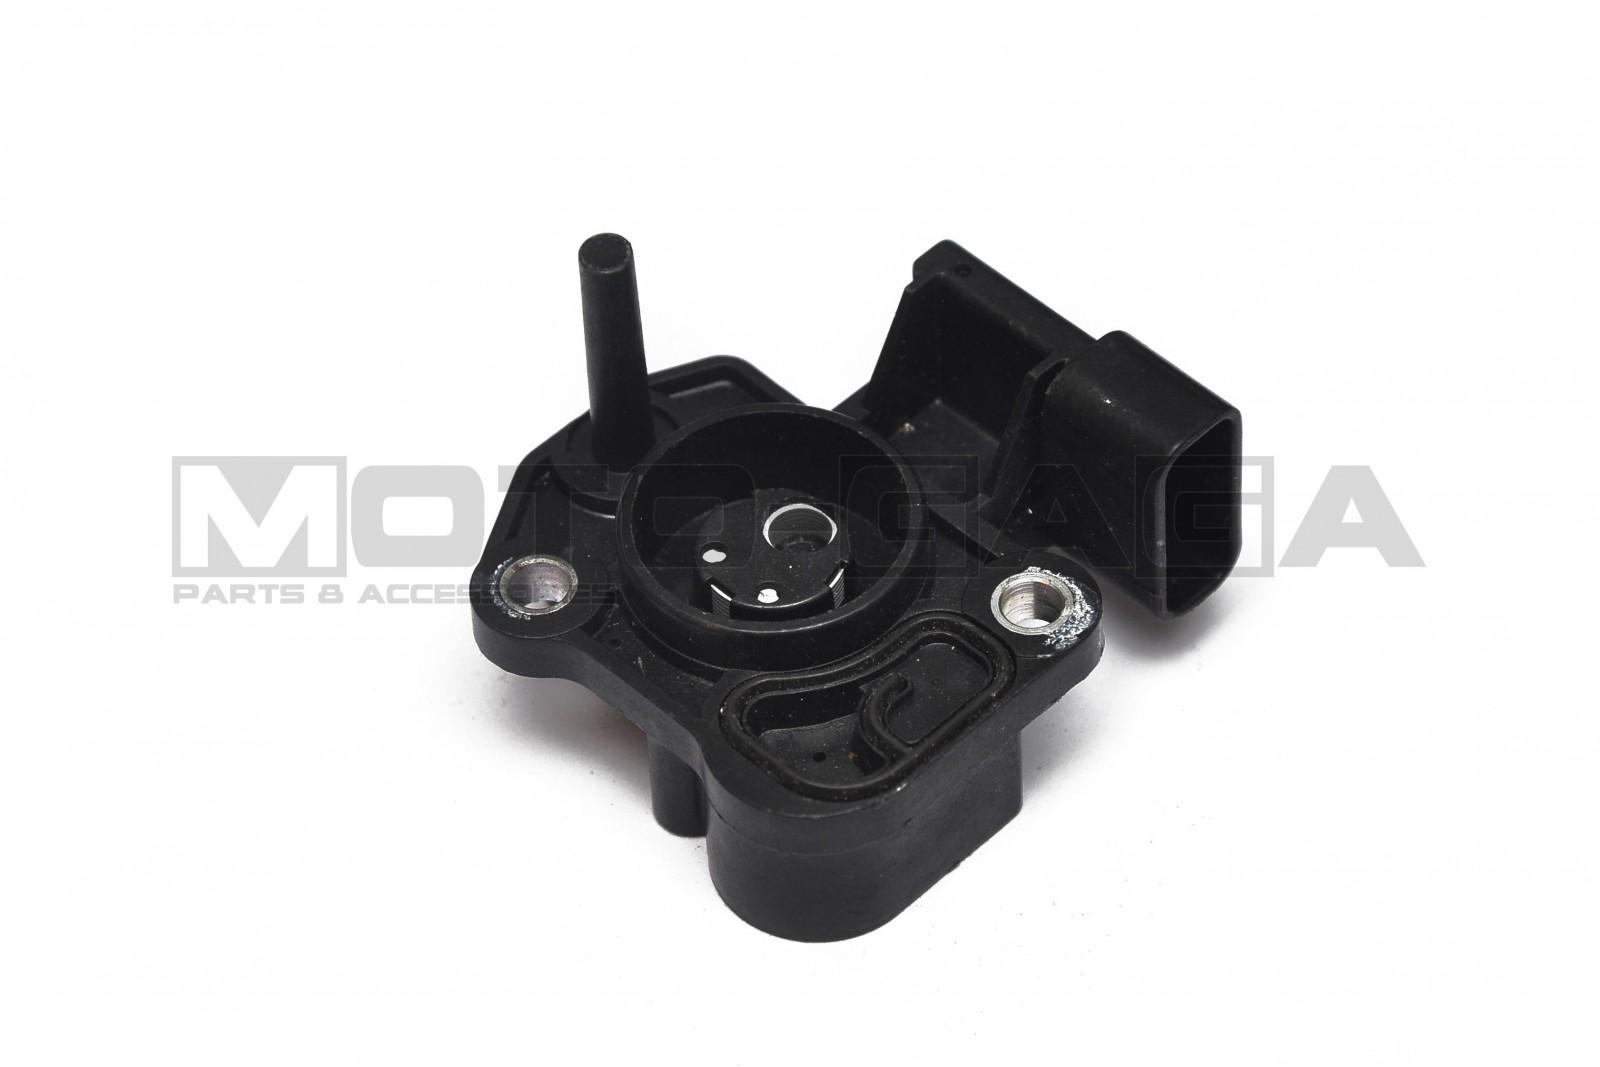 SYS Racing TPS sensor for Yamaha (2014-) Throttle Body (YZF-R15/Fz150i  Vixion/Y15ZR/Jupiter MX King T150)